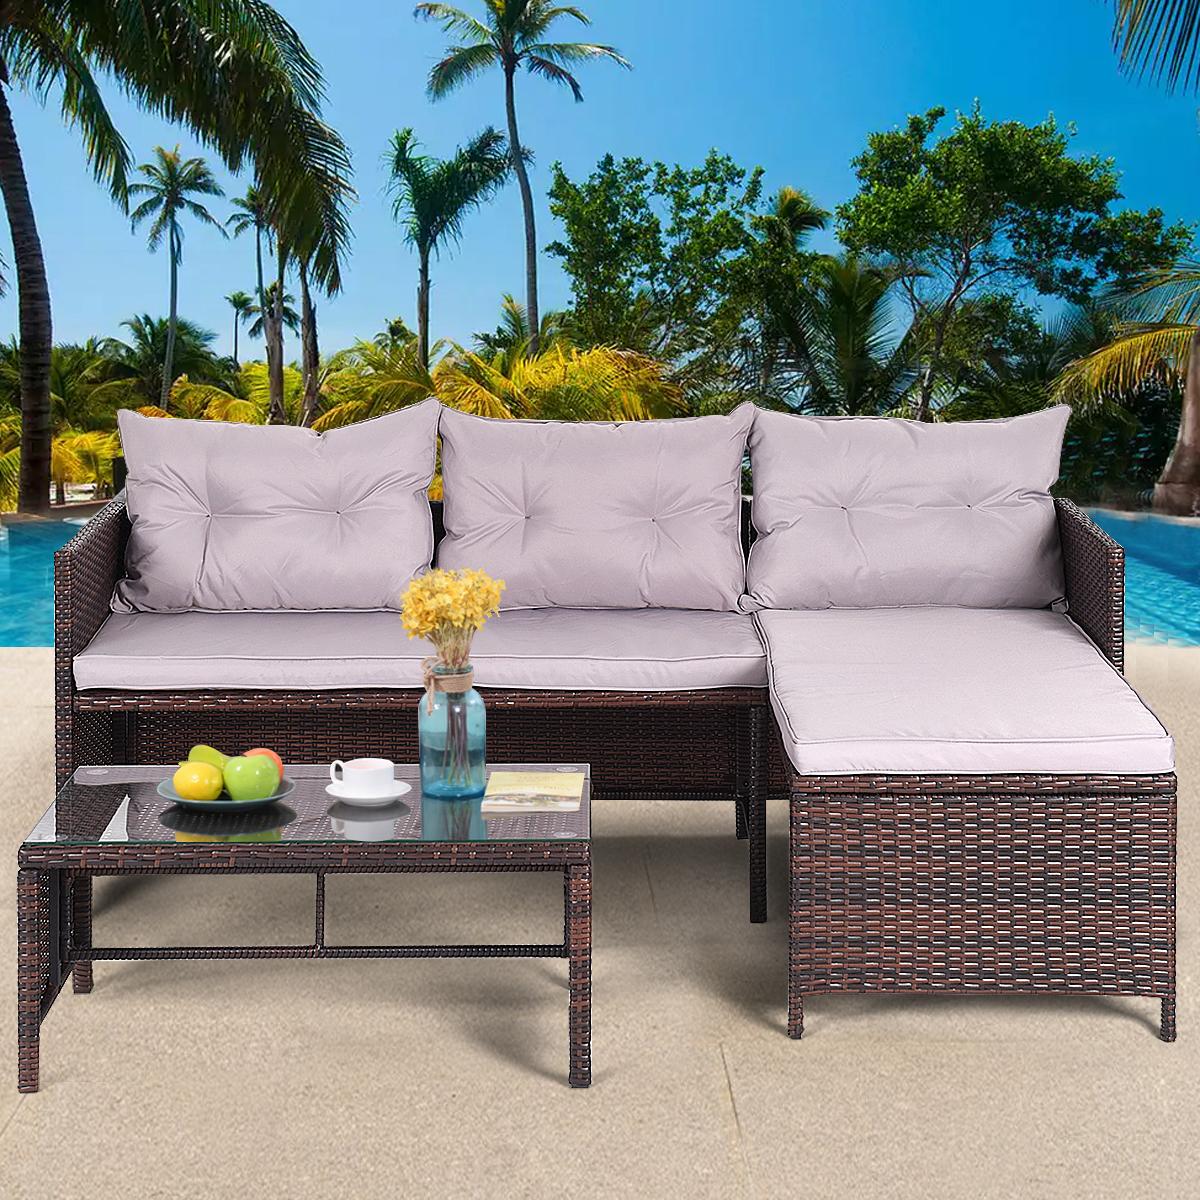 Gymax 3PC Rattan Furniture Sofa Lounge Chaise Set Outdoor Patio Garden